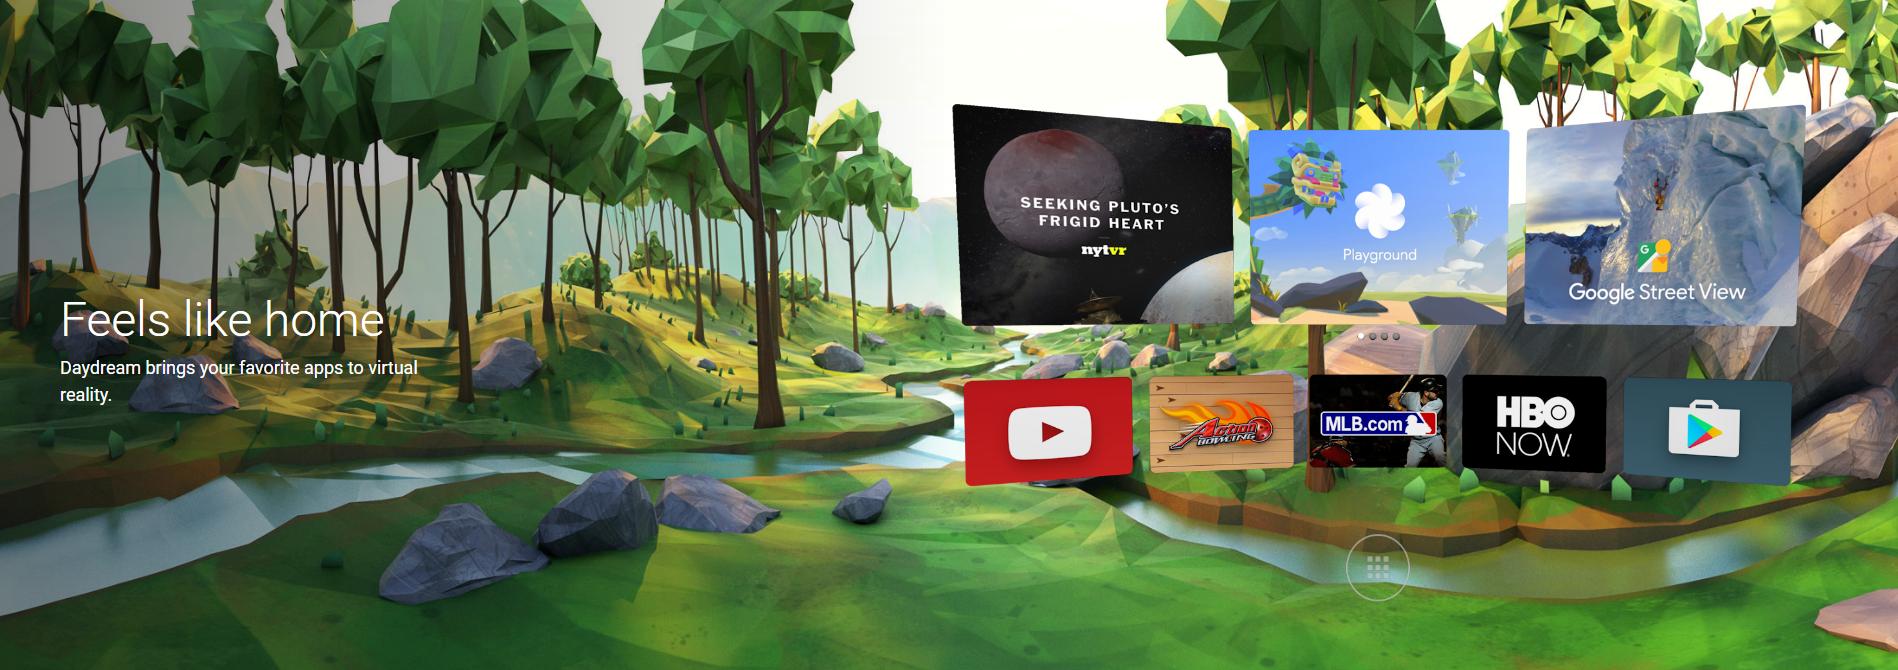 virtual reality Google YouTube